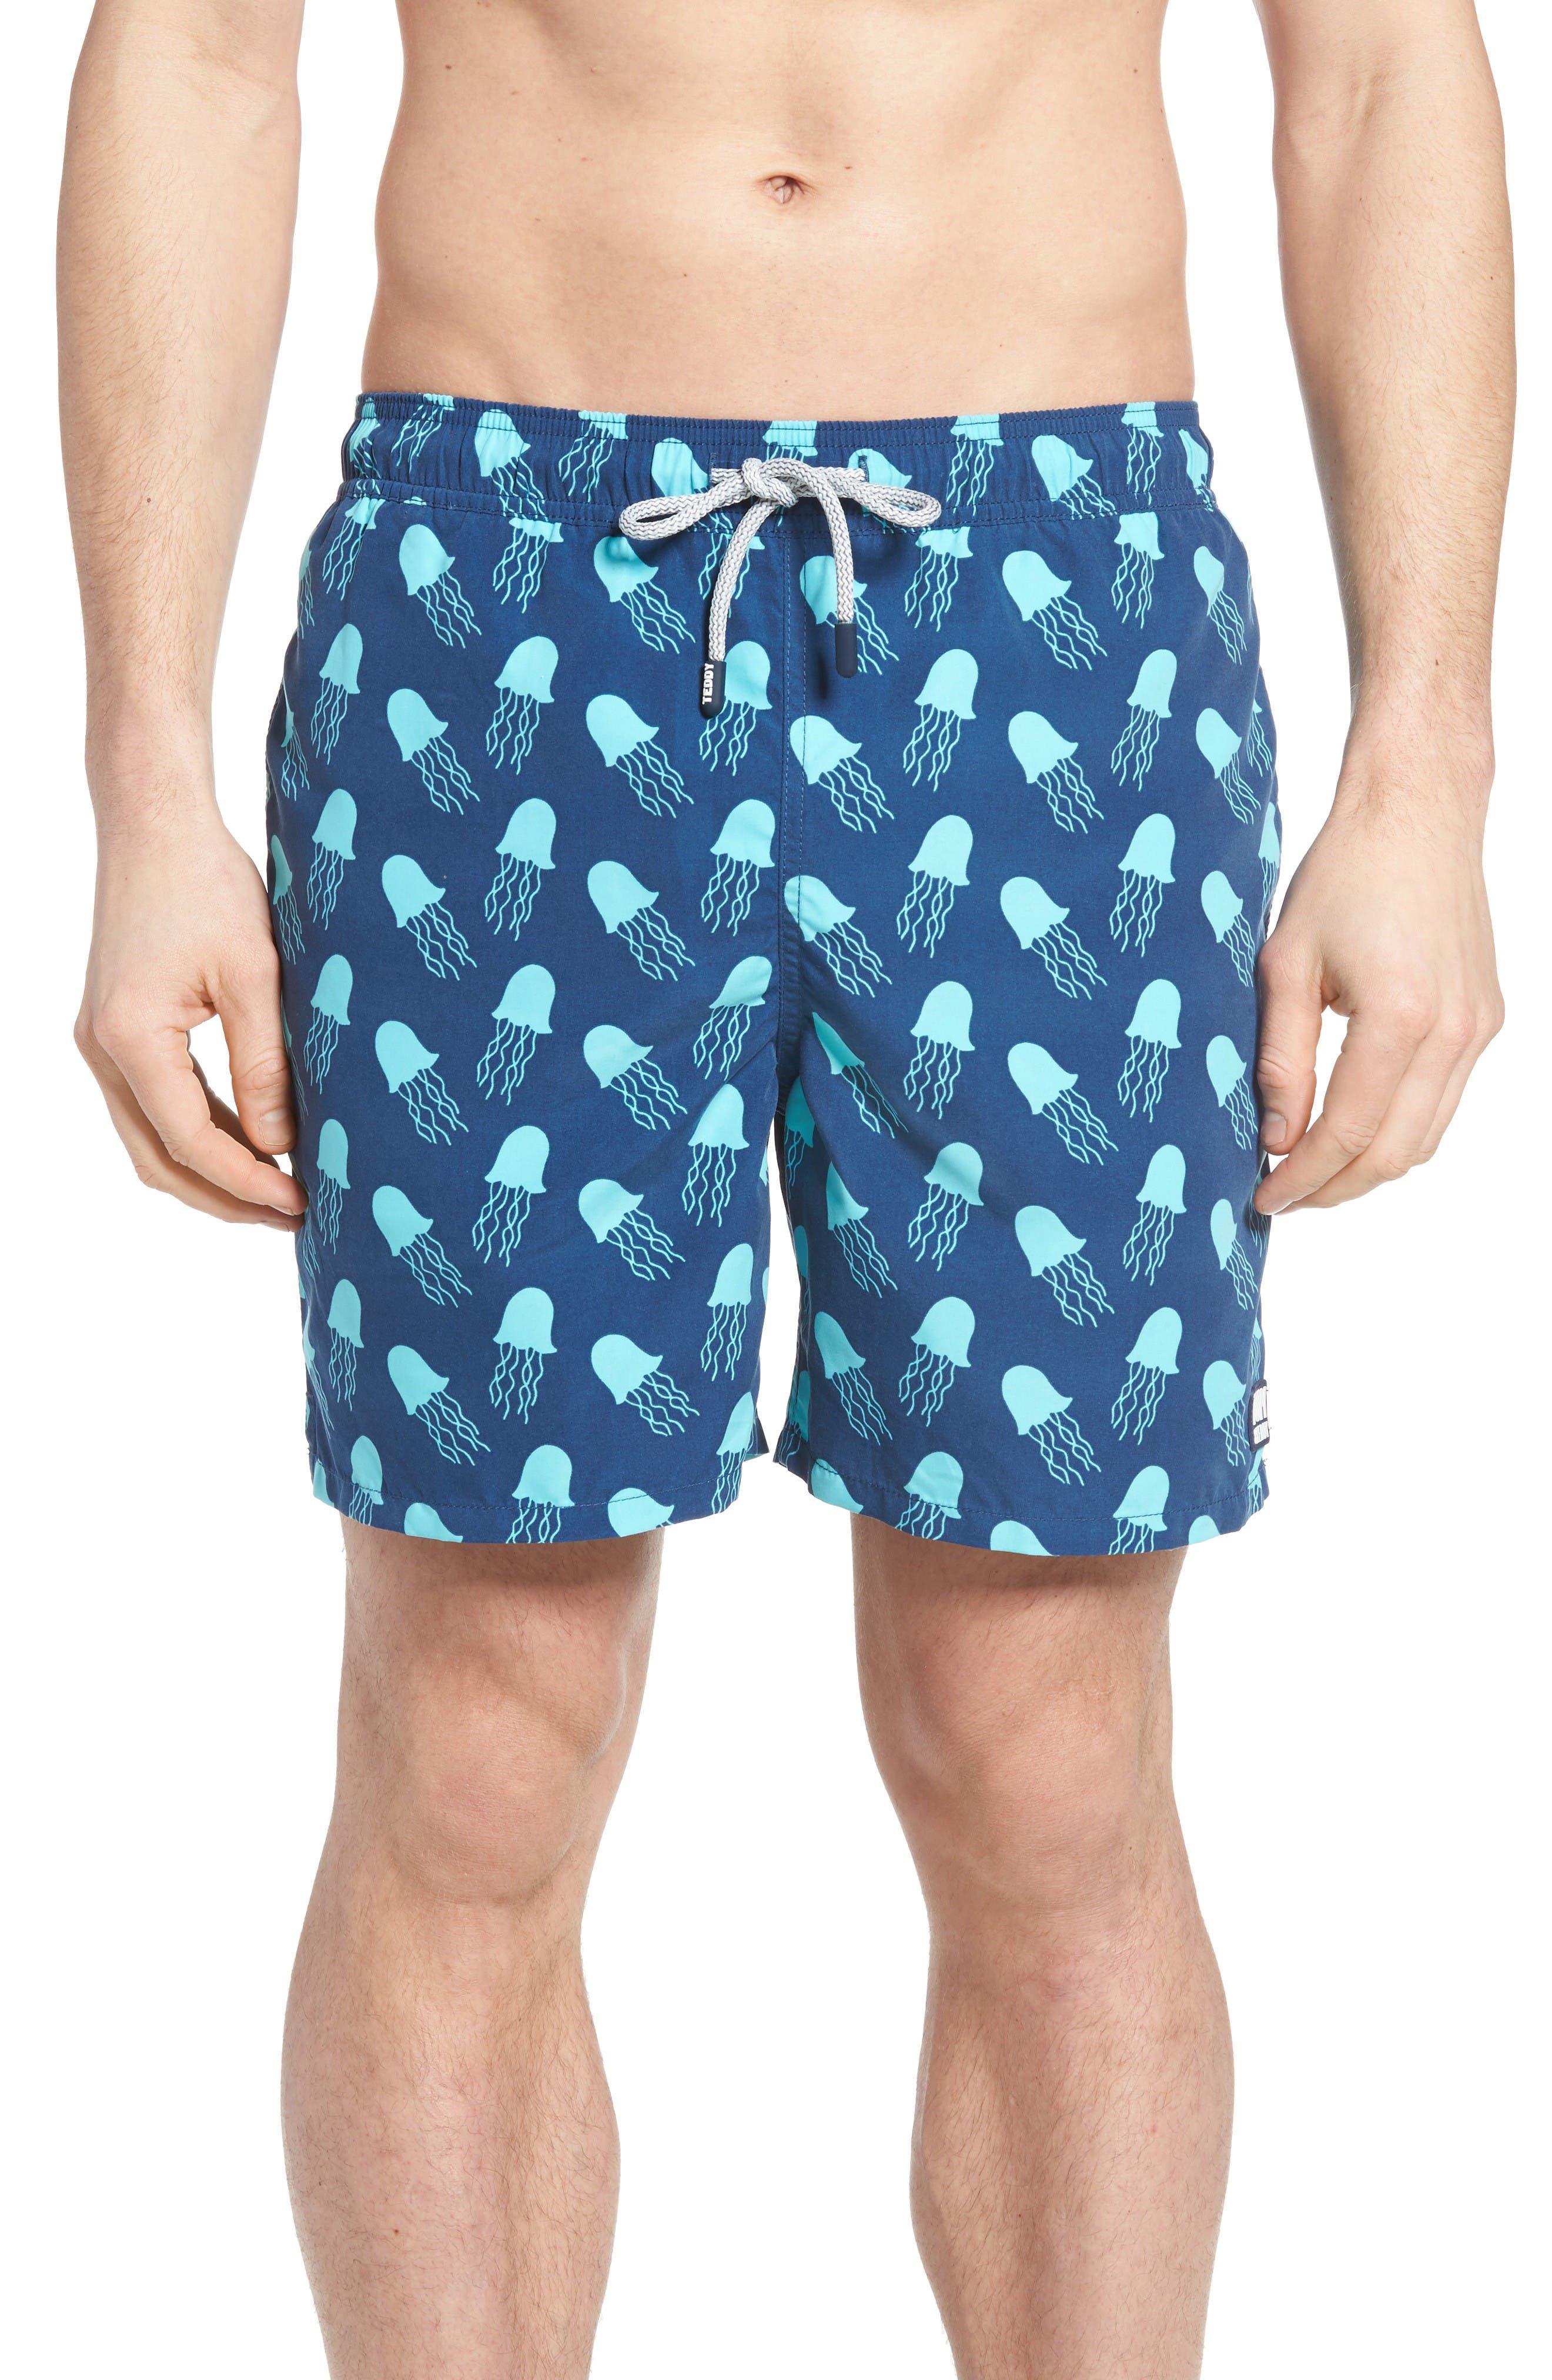 Jellyfish Print Swim Trunks,                             Main thumbnail 1, color,                             Navy Turquoise